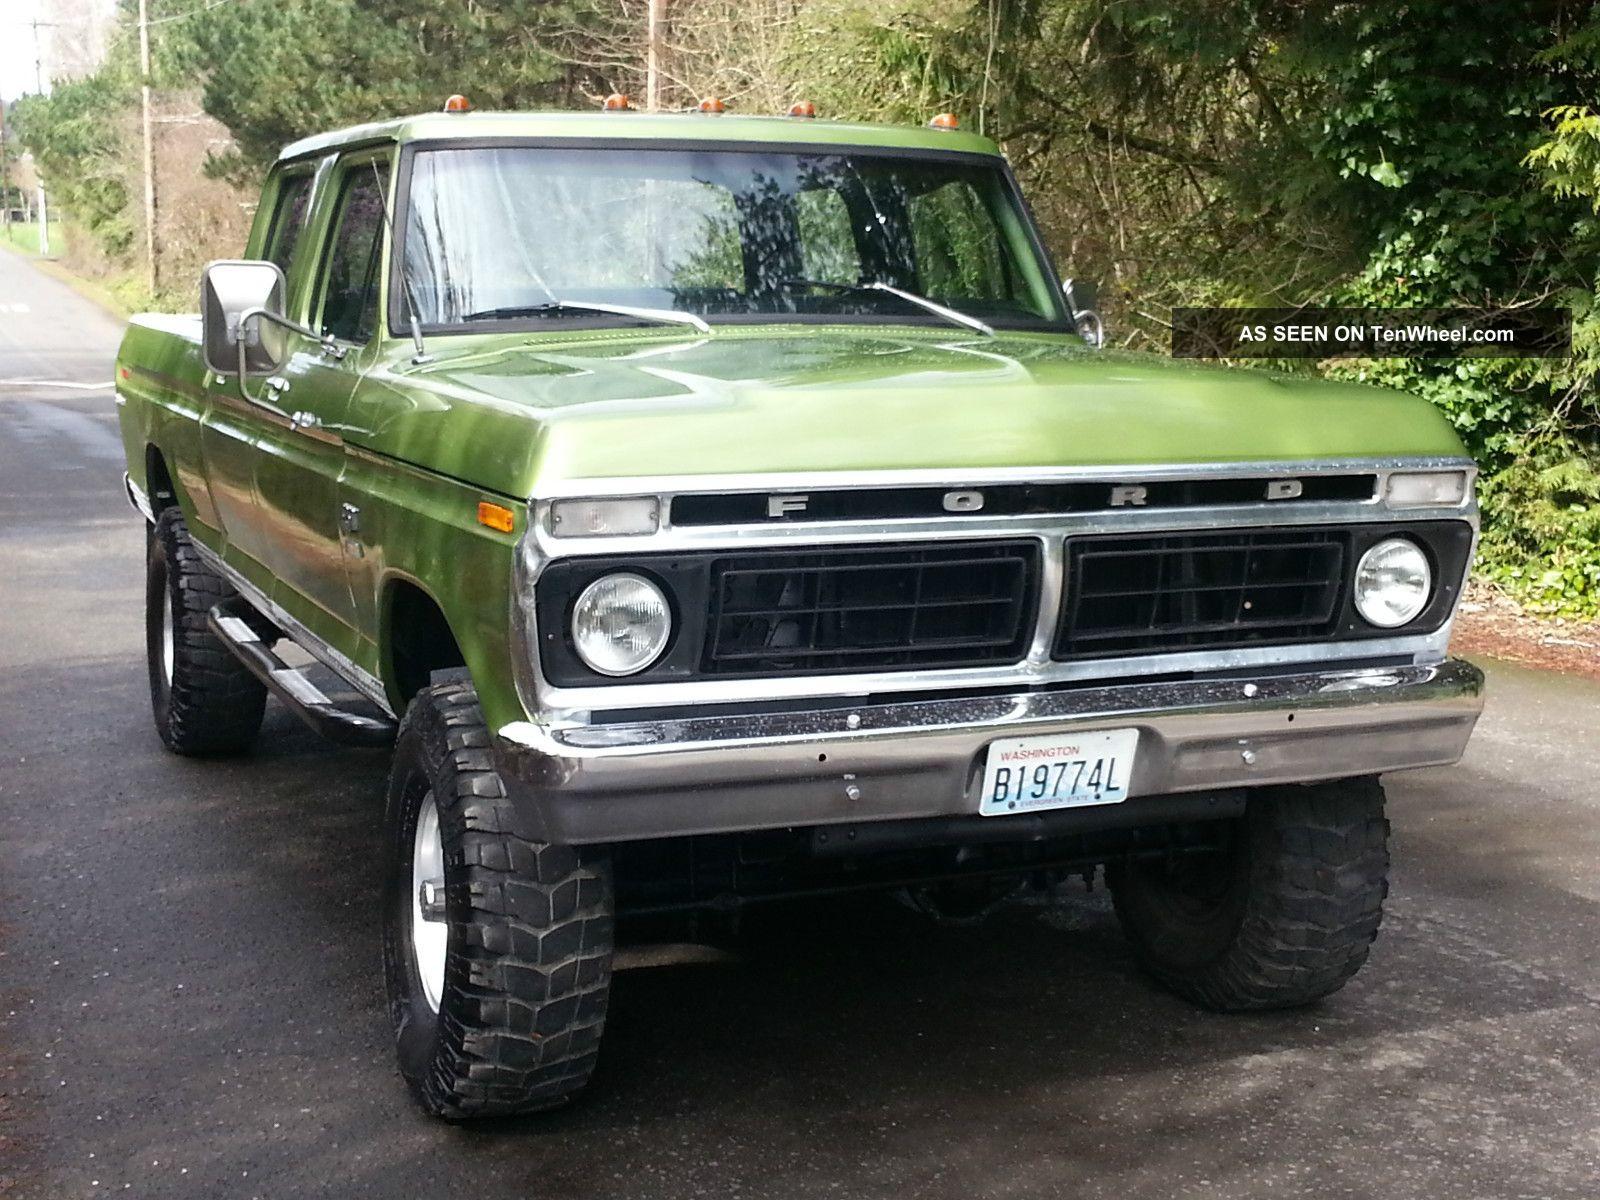 1975 Dodge Crew Cab 4x4 For Sale.html   Autos Post